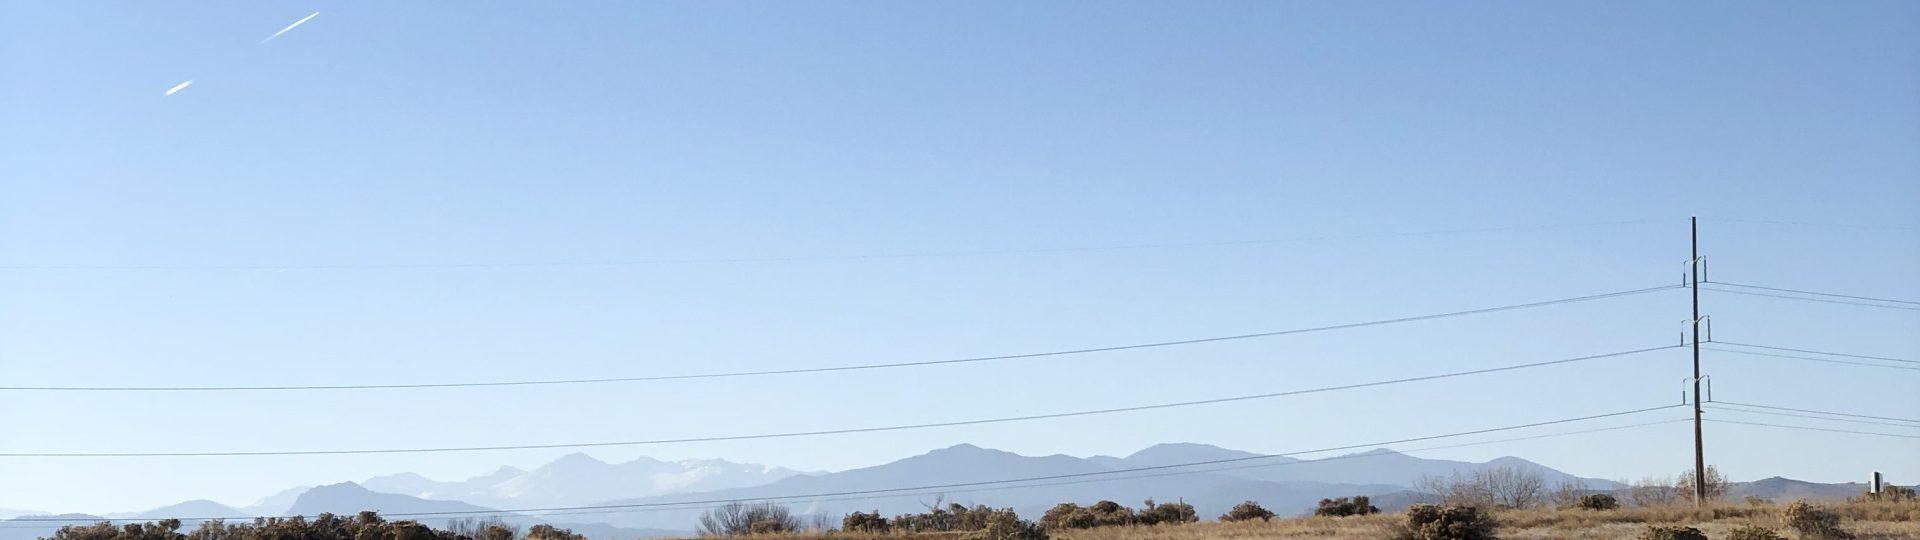 Fort Collins to Loveland (and back) via bike